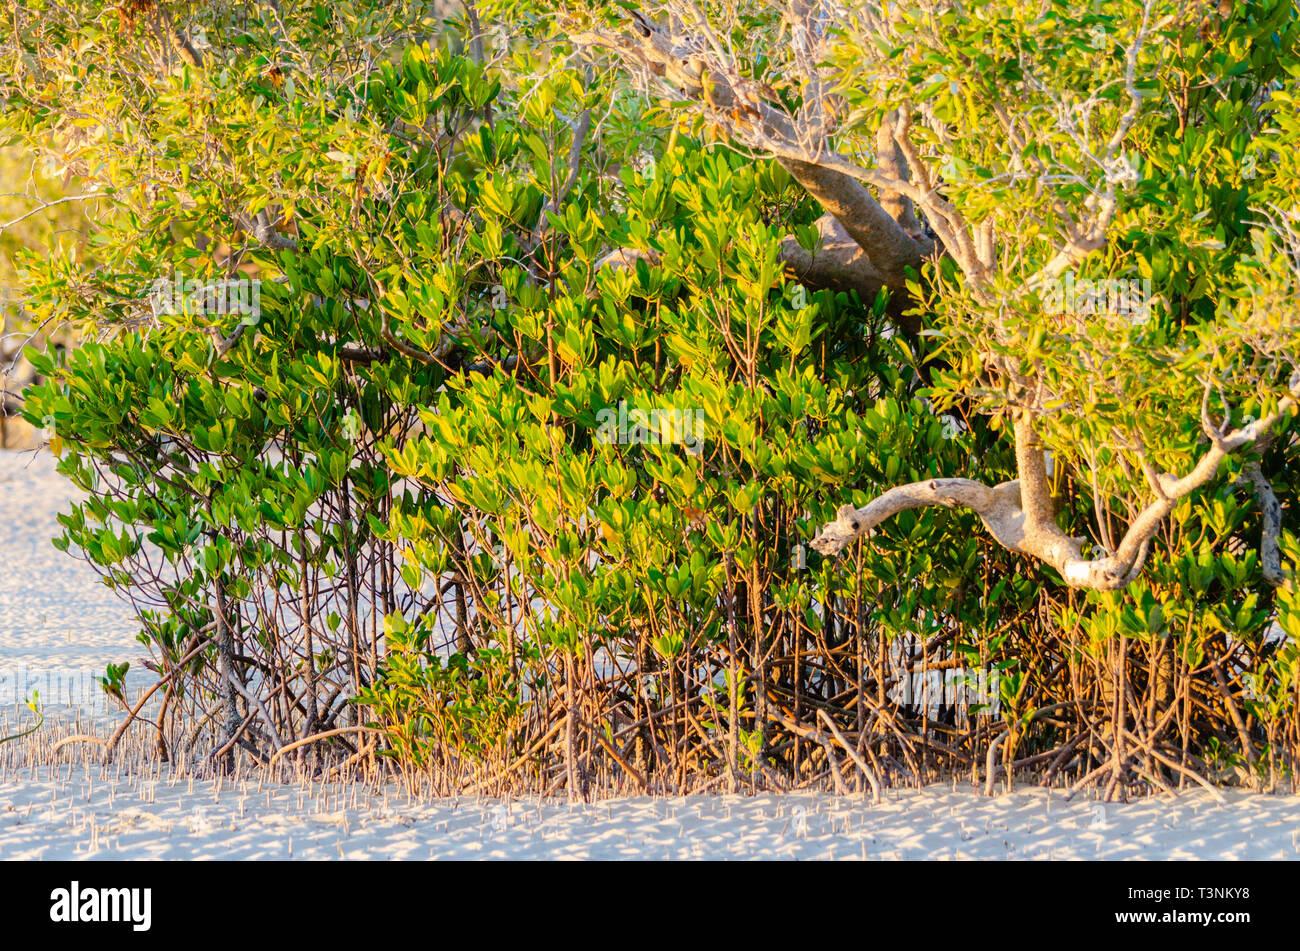 Stilt-rooted mangrove (Rhizophora stylosa) growing on sandy tidal flat at Port Smith Western Australia - Stock Image